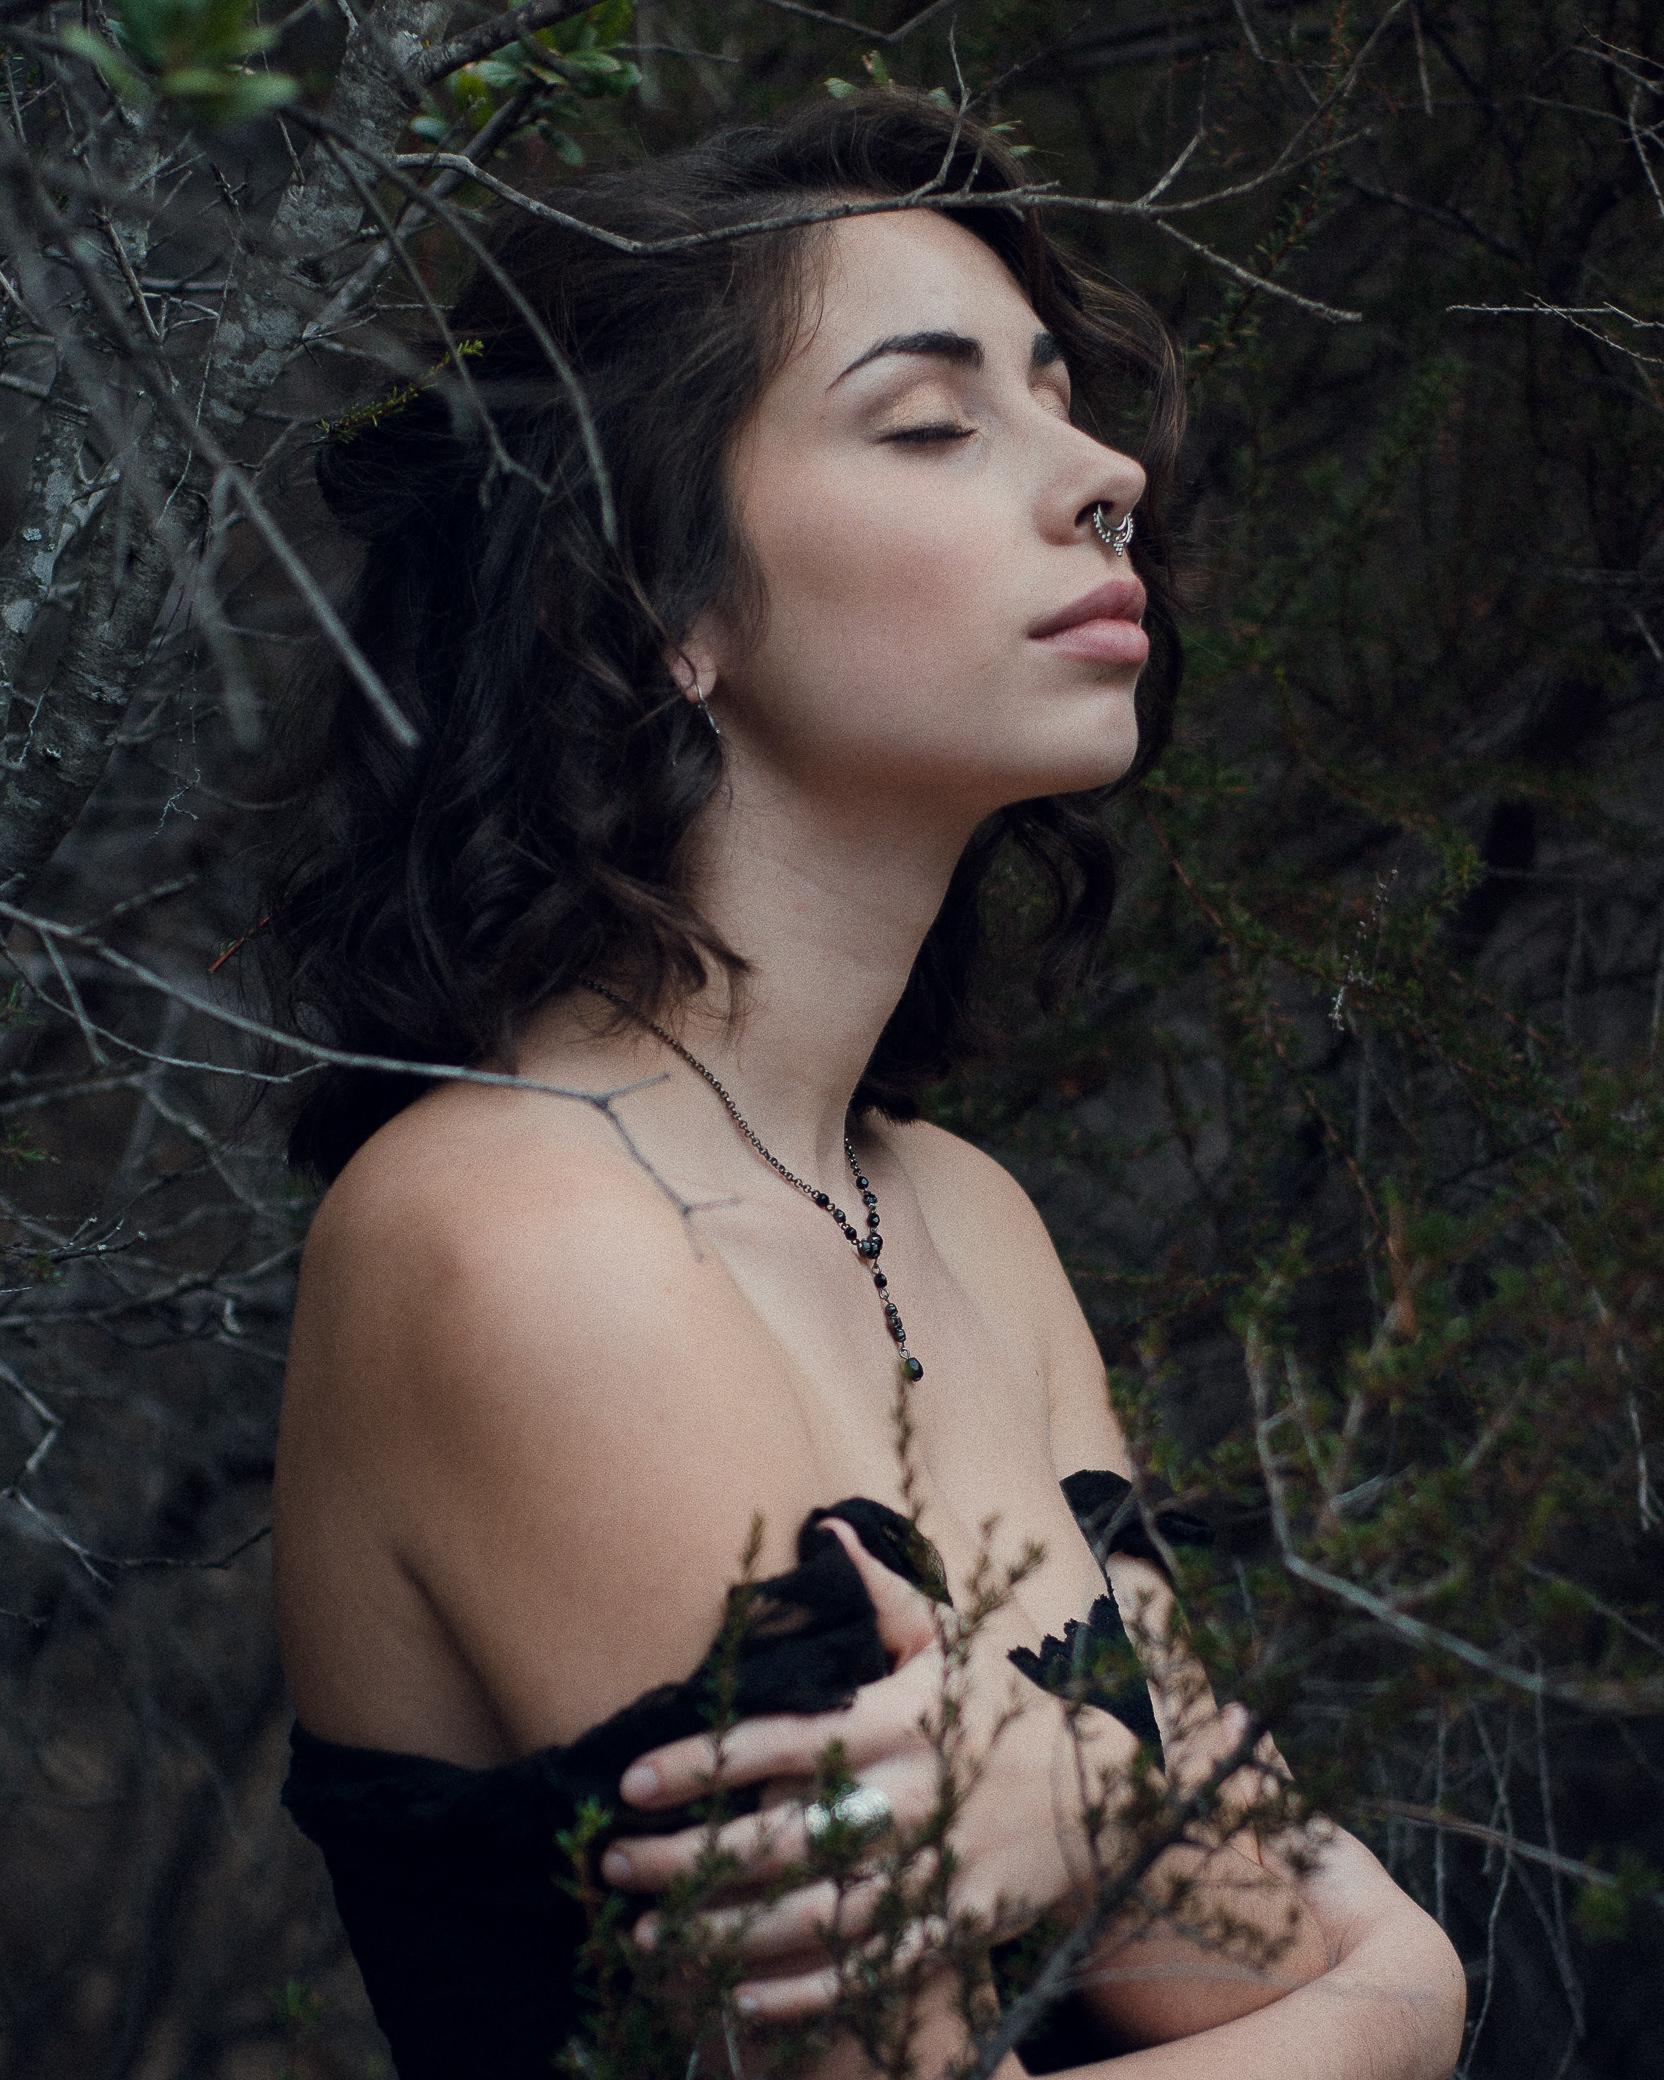 los angeles fashion portrait photographer miranda kelton photography